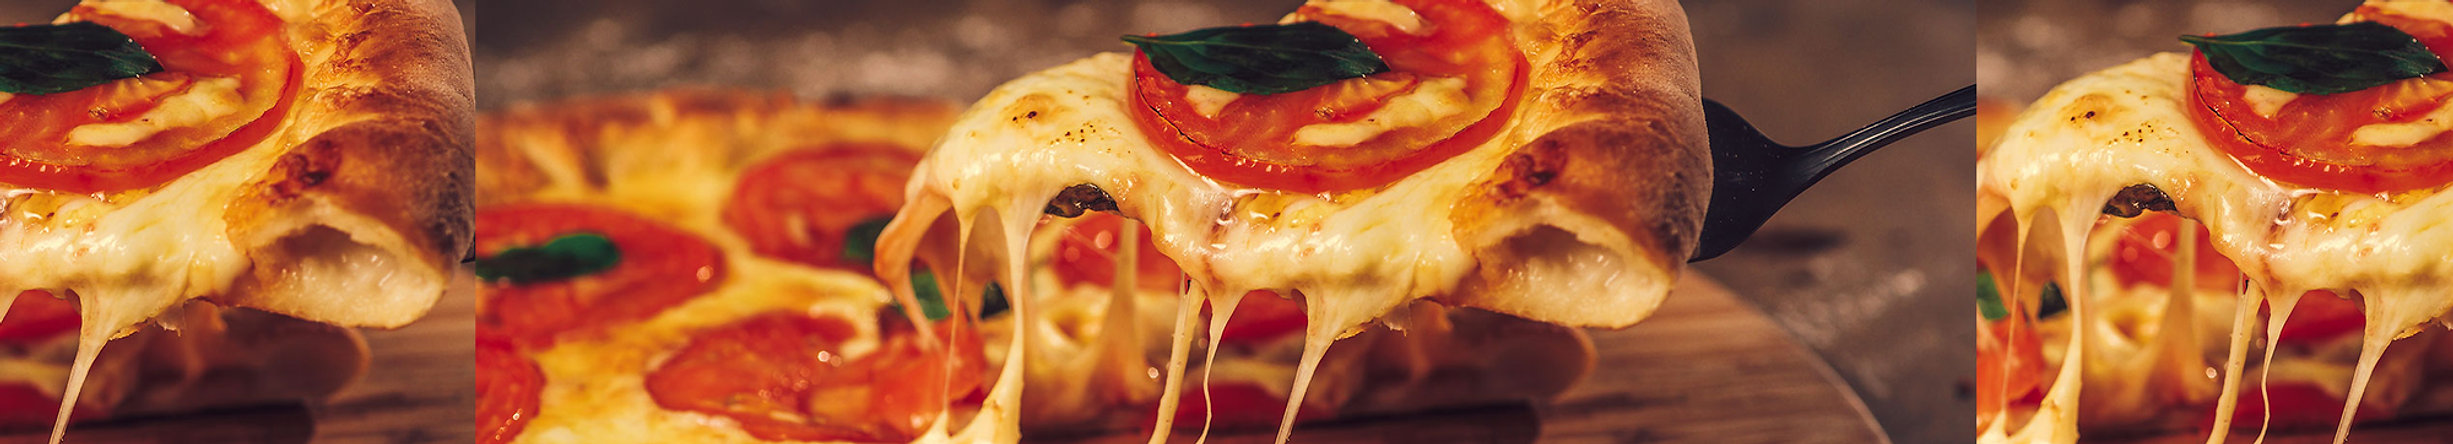 banner_pizzas.jpg